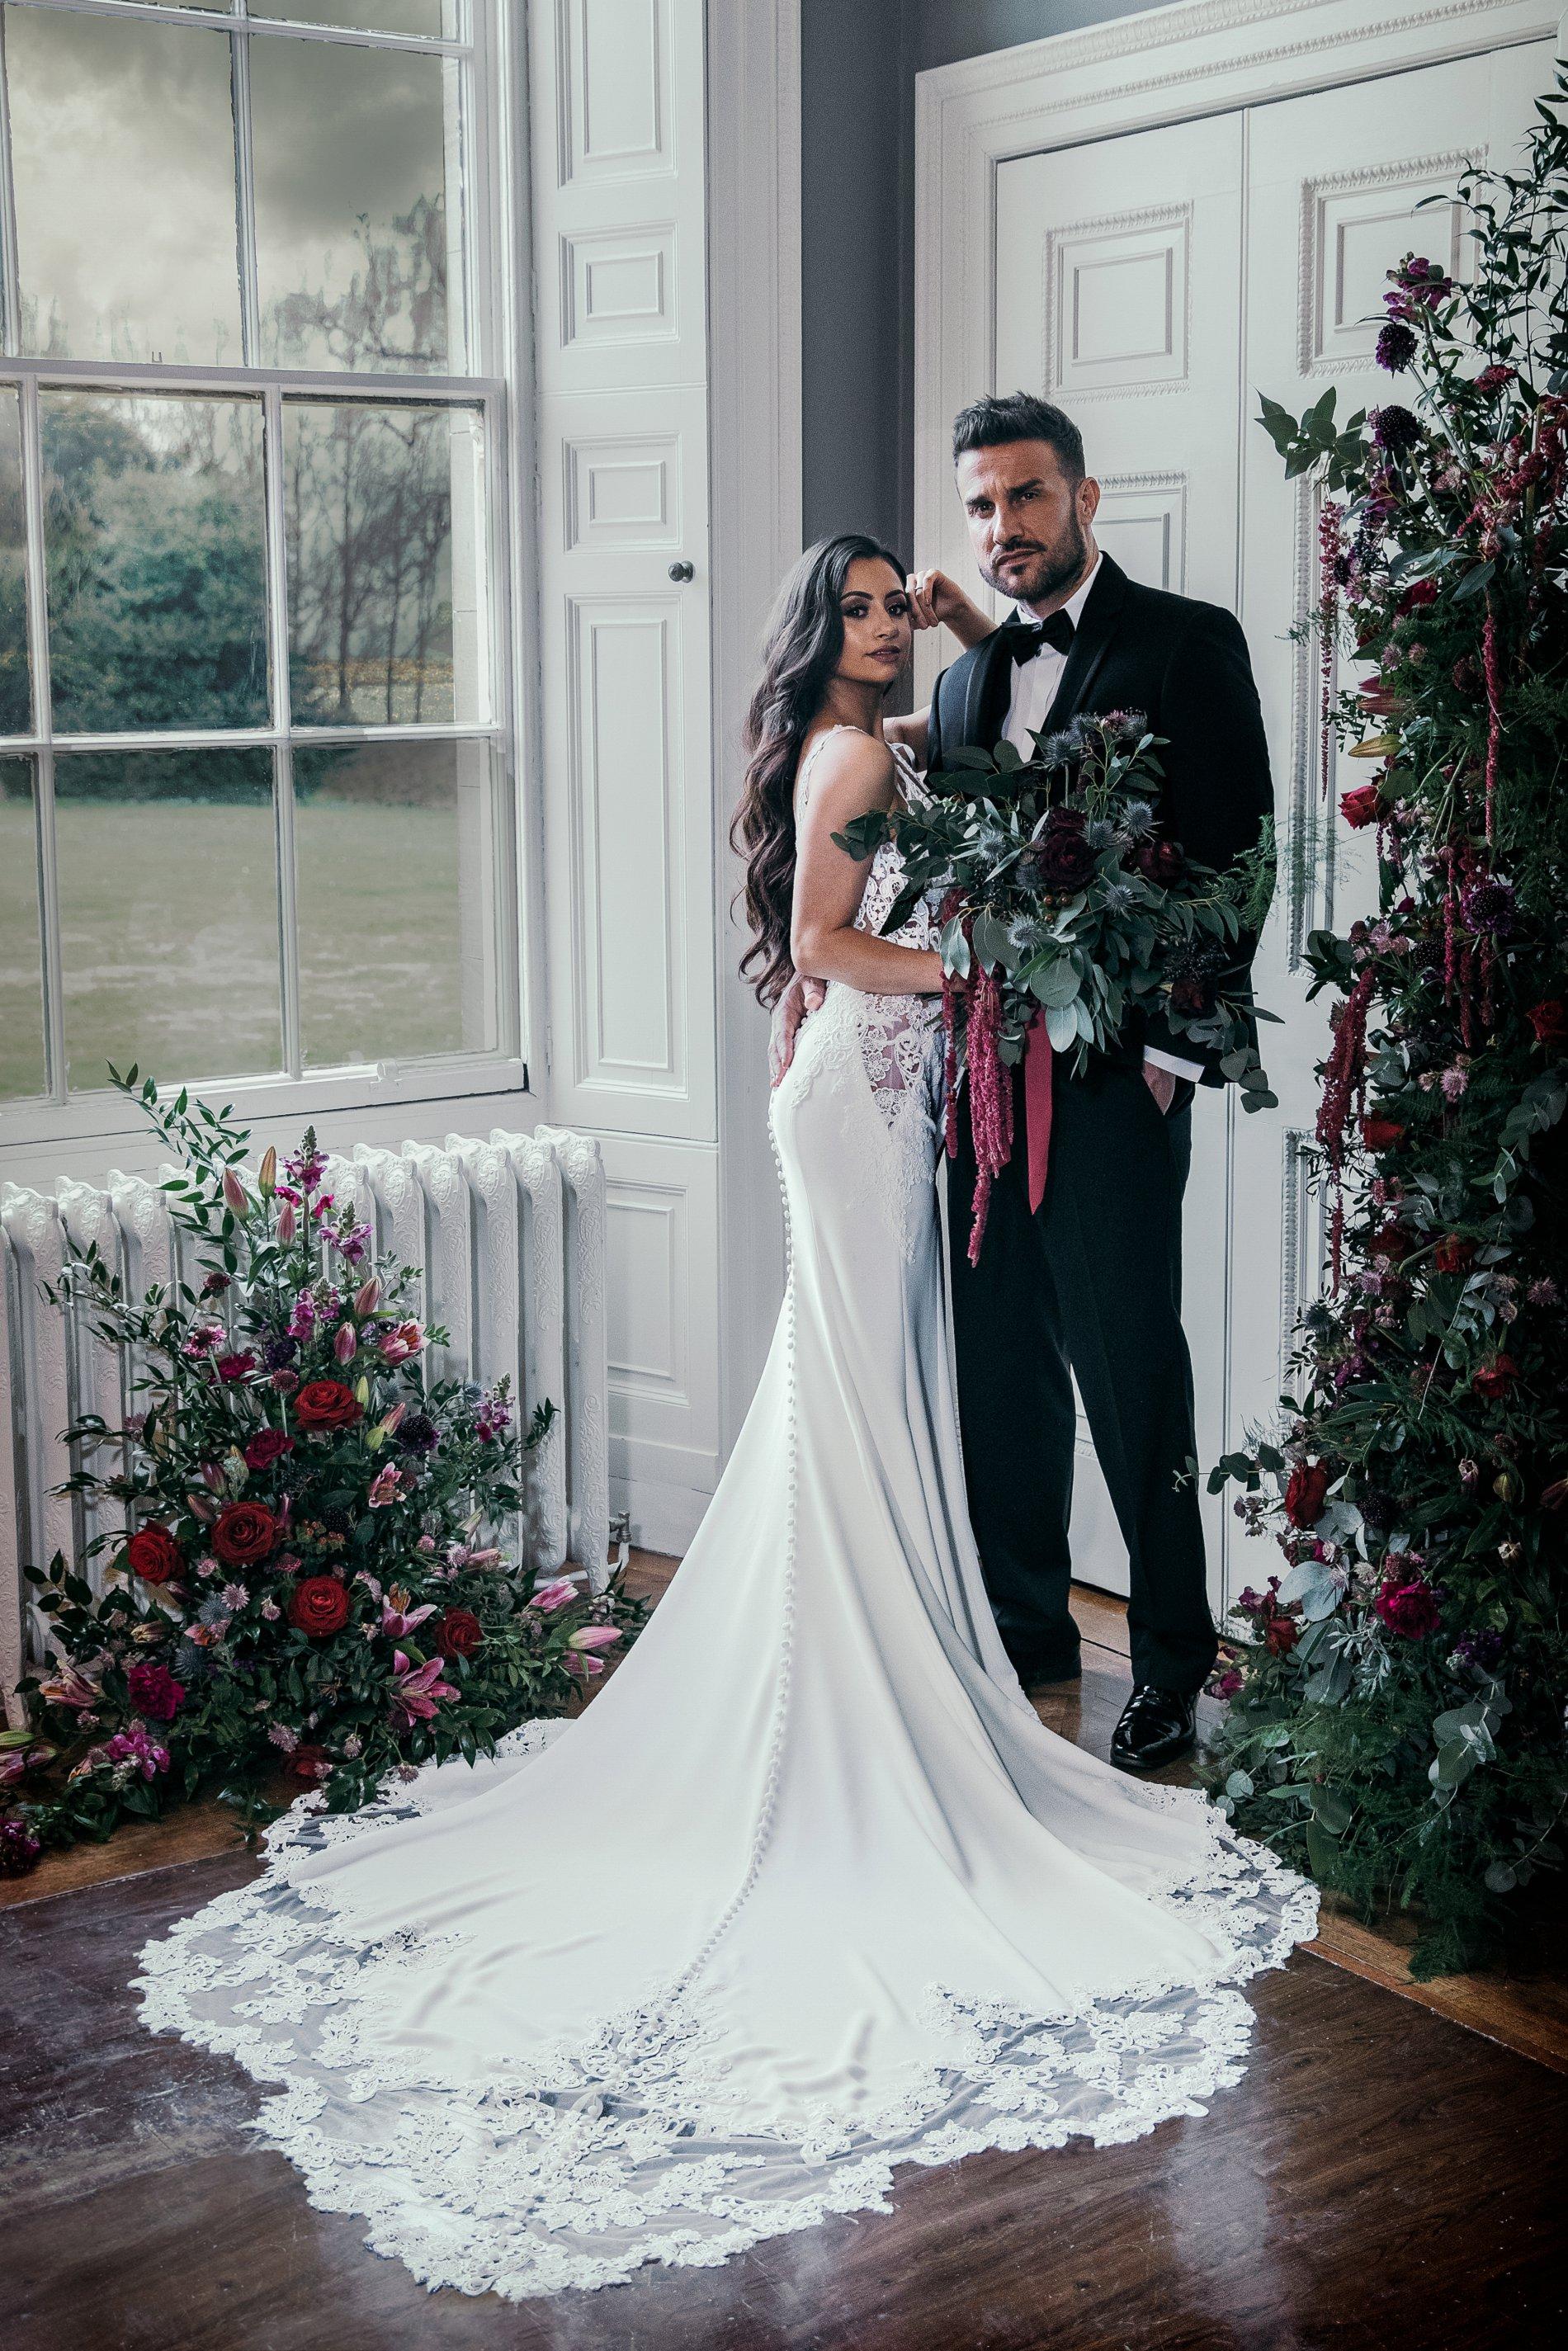 A Black Tie Wedding Creative Shoot at Saltmarshe Hall (c) Natalie Hamilton Photography (23)